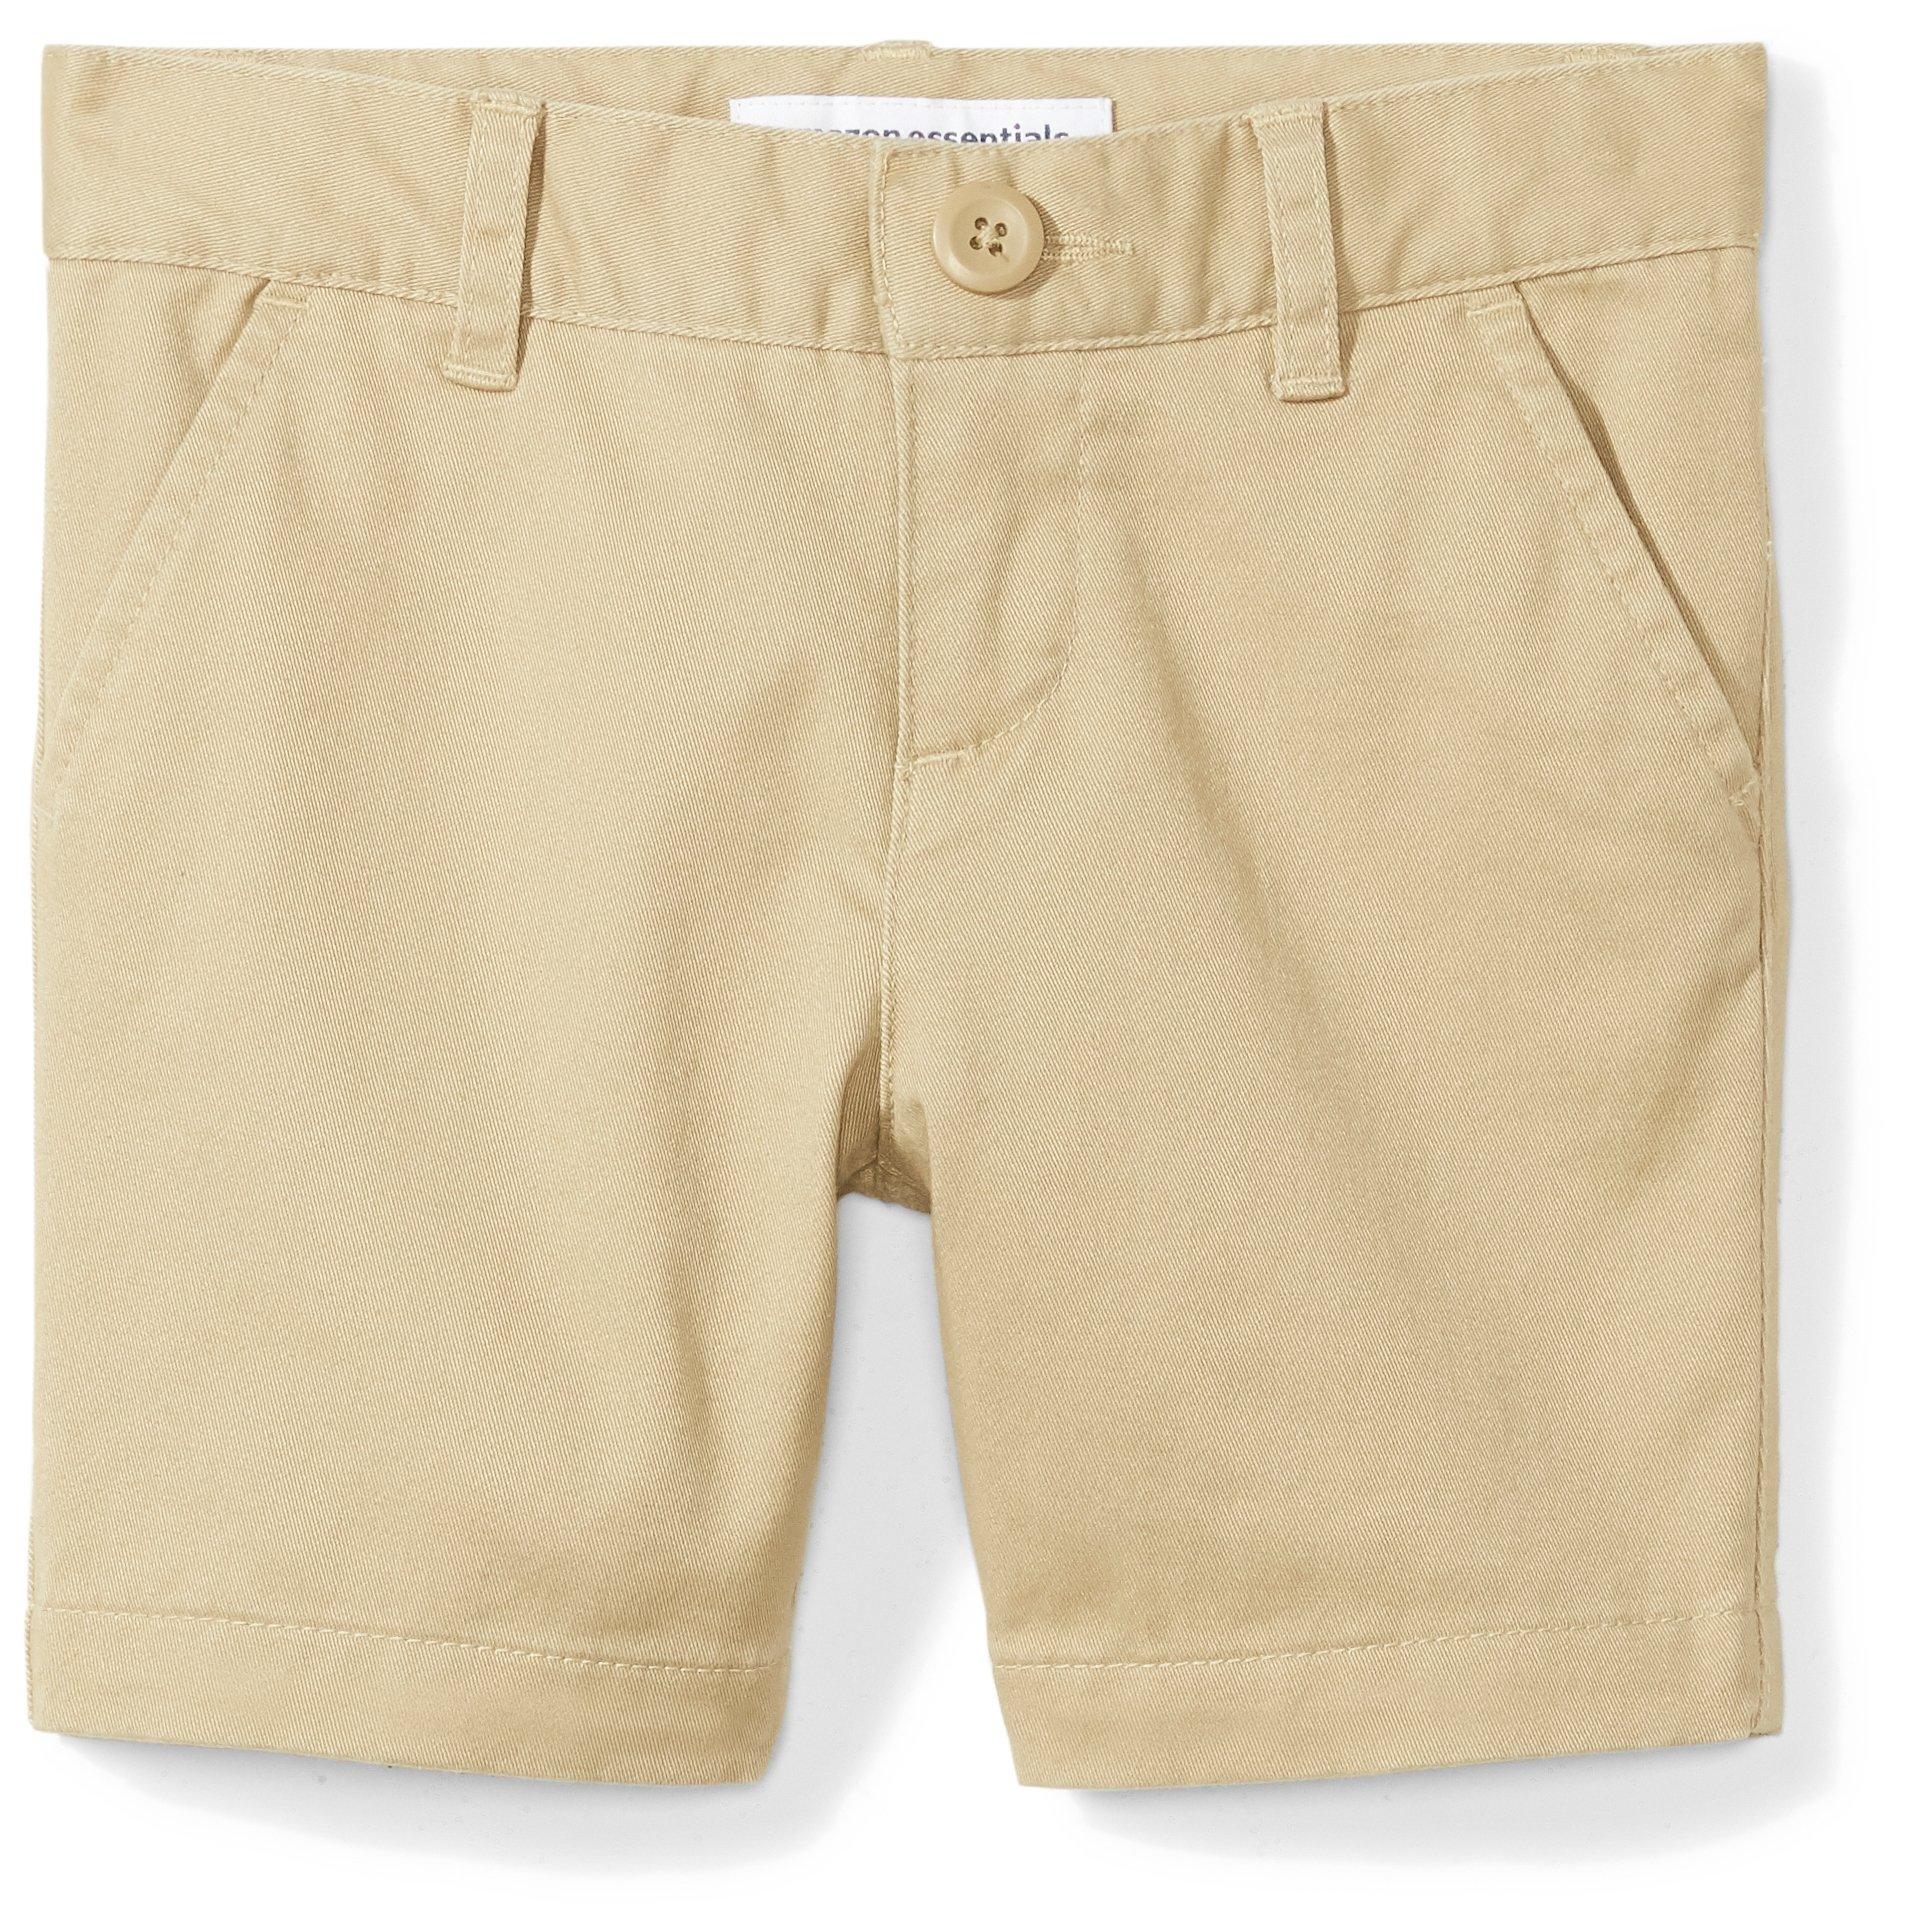 Amazon Essentials Girls' Uniform Short, Khaki,10